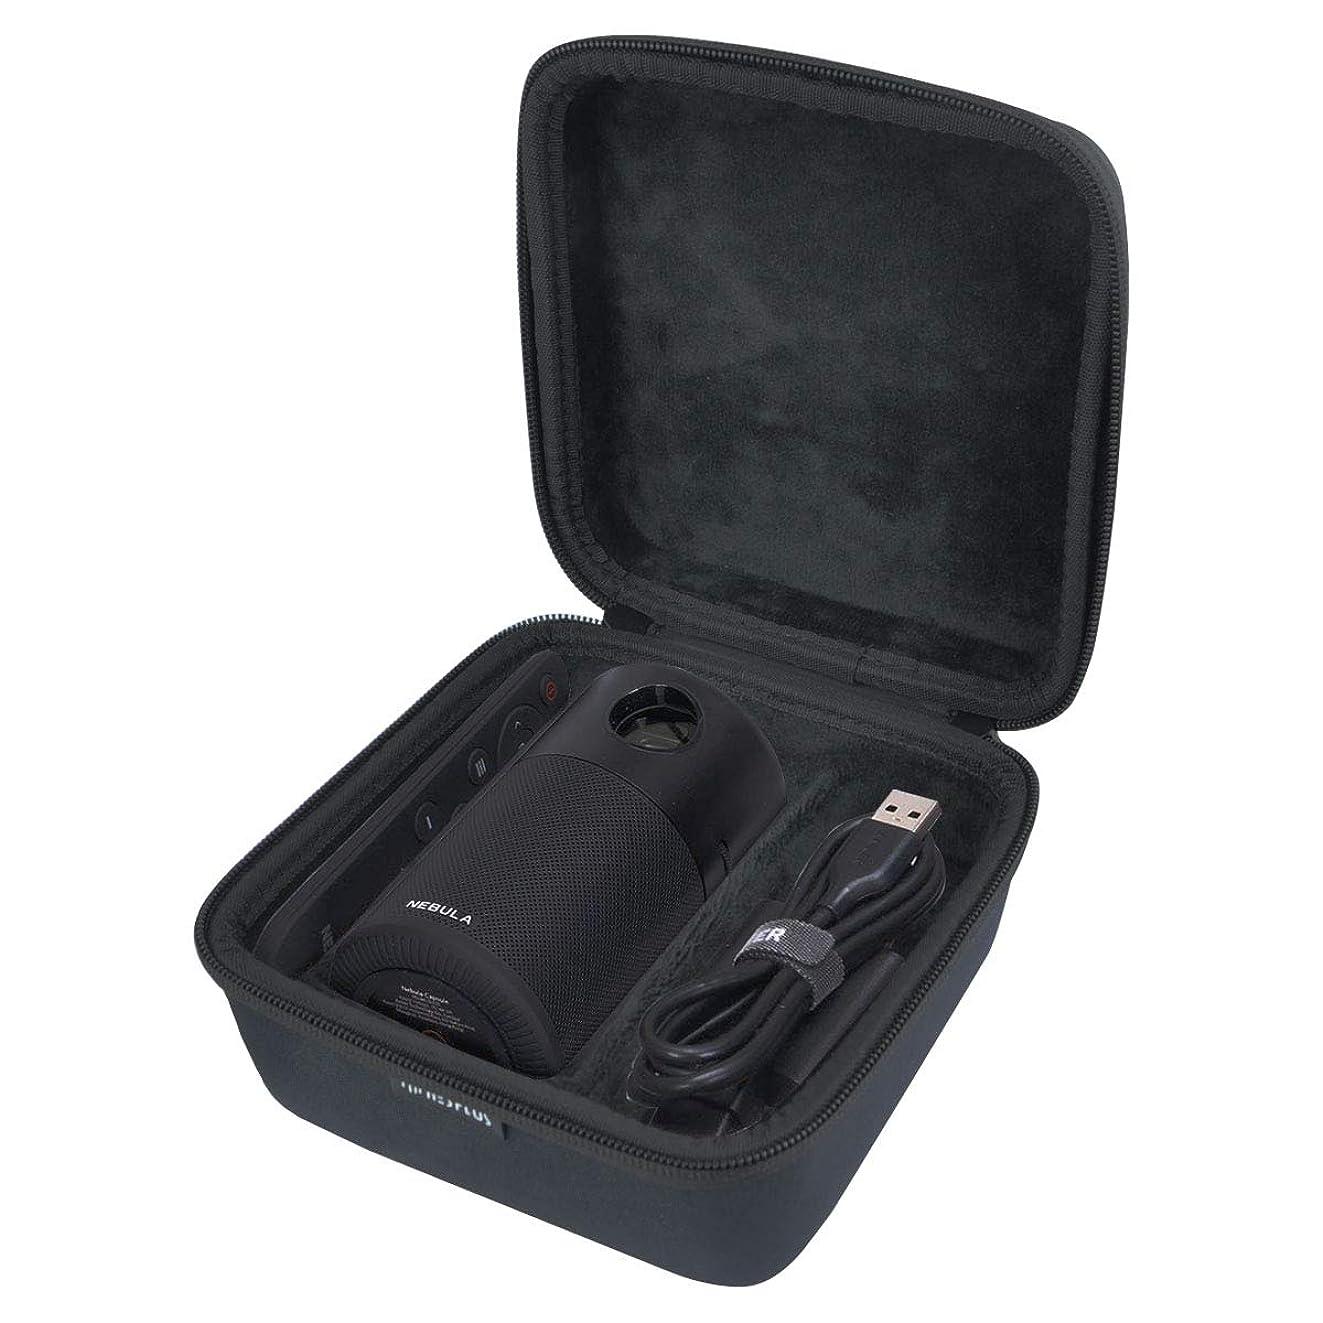 HESPLUS Shockproof Hard Storage Case for Nebula Capsule Smart Mini Projector